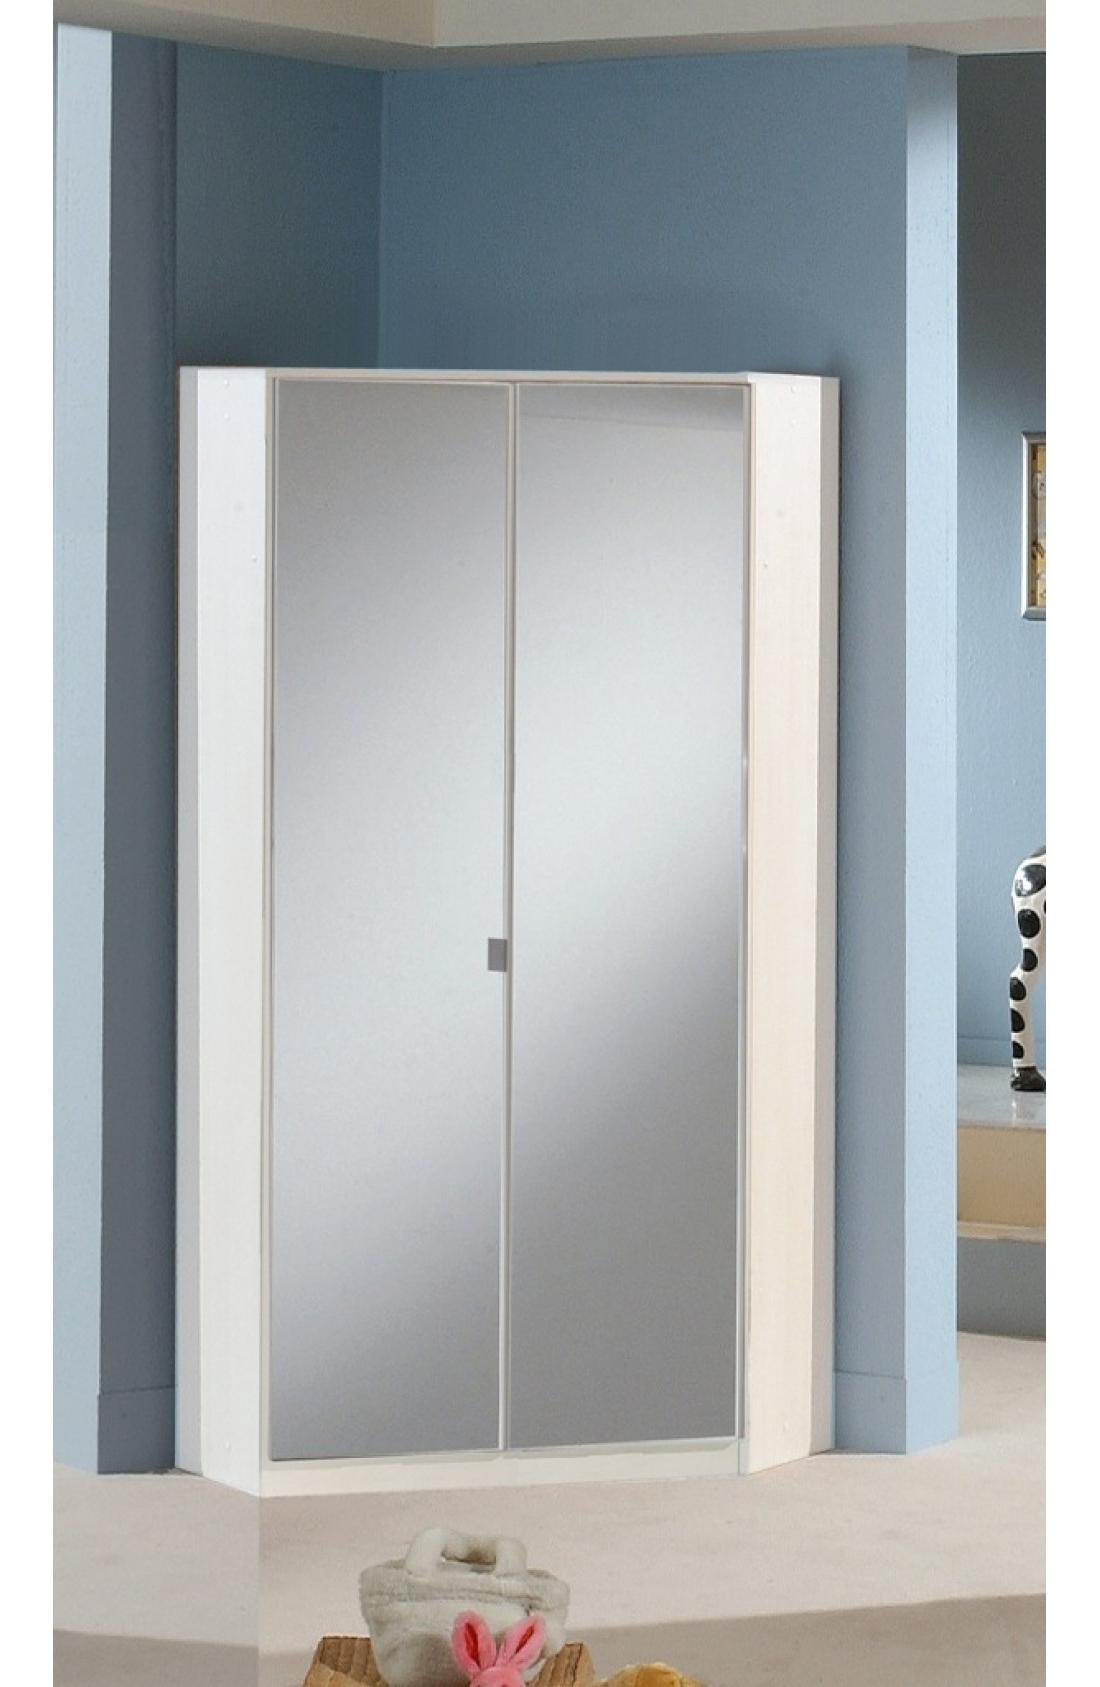 Slumberhaus Gamma German Made Modern White And Mirror 2 Door For Widely Used Corner Mirror Wardrobes (View 2 of 15)